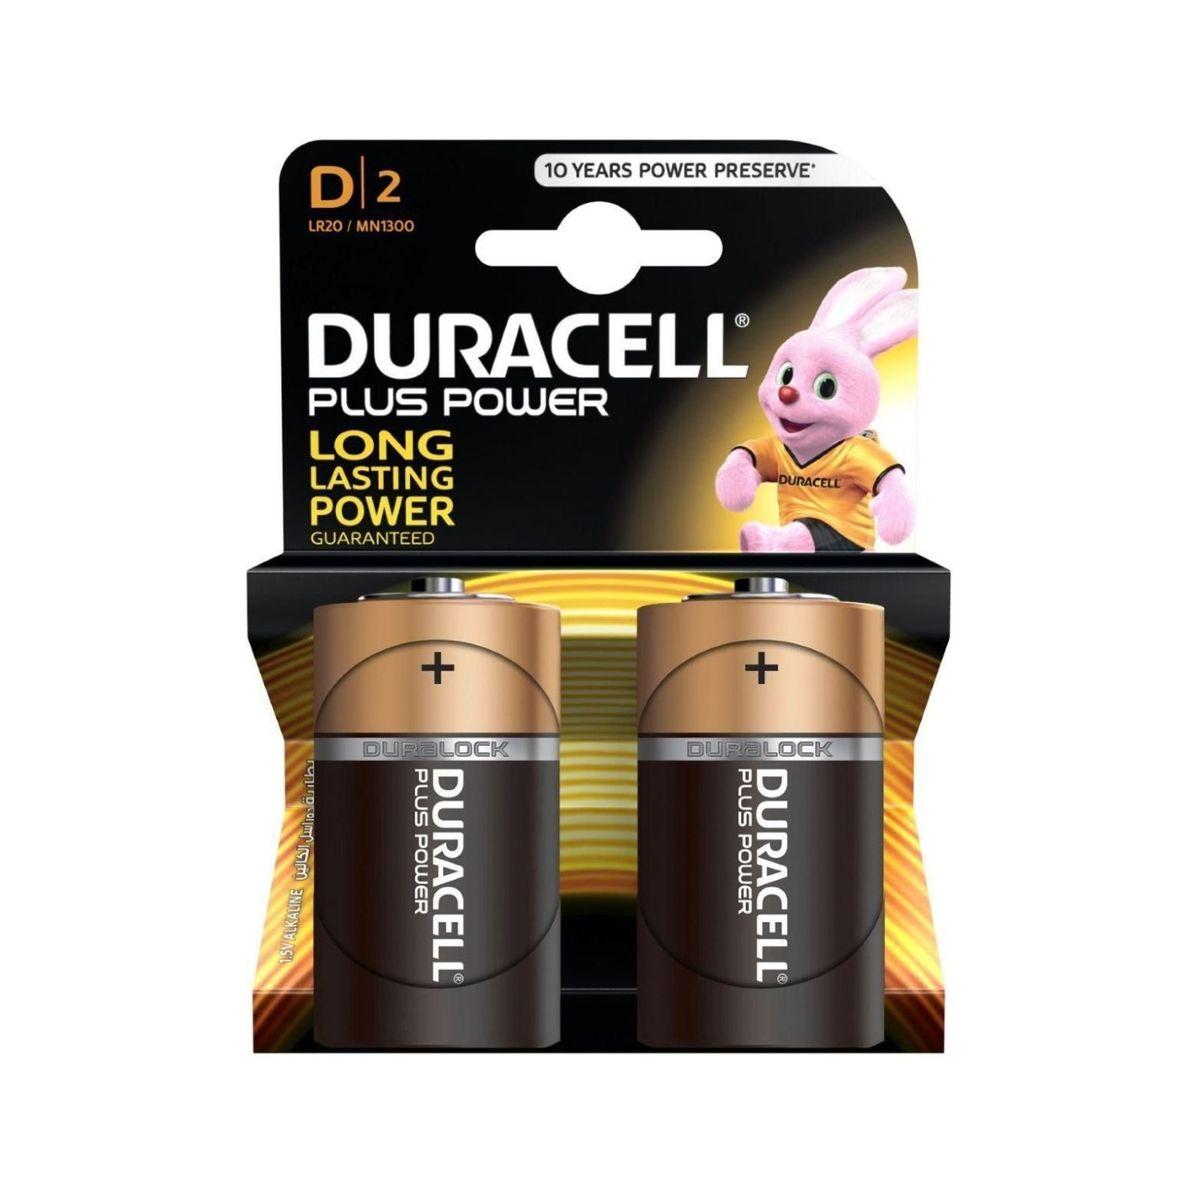 Duracell Plus Power Type D Alkaline Battries [2 Pack]